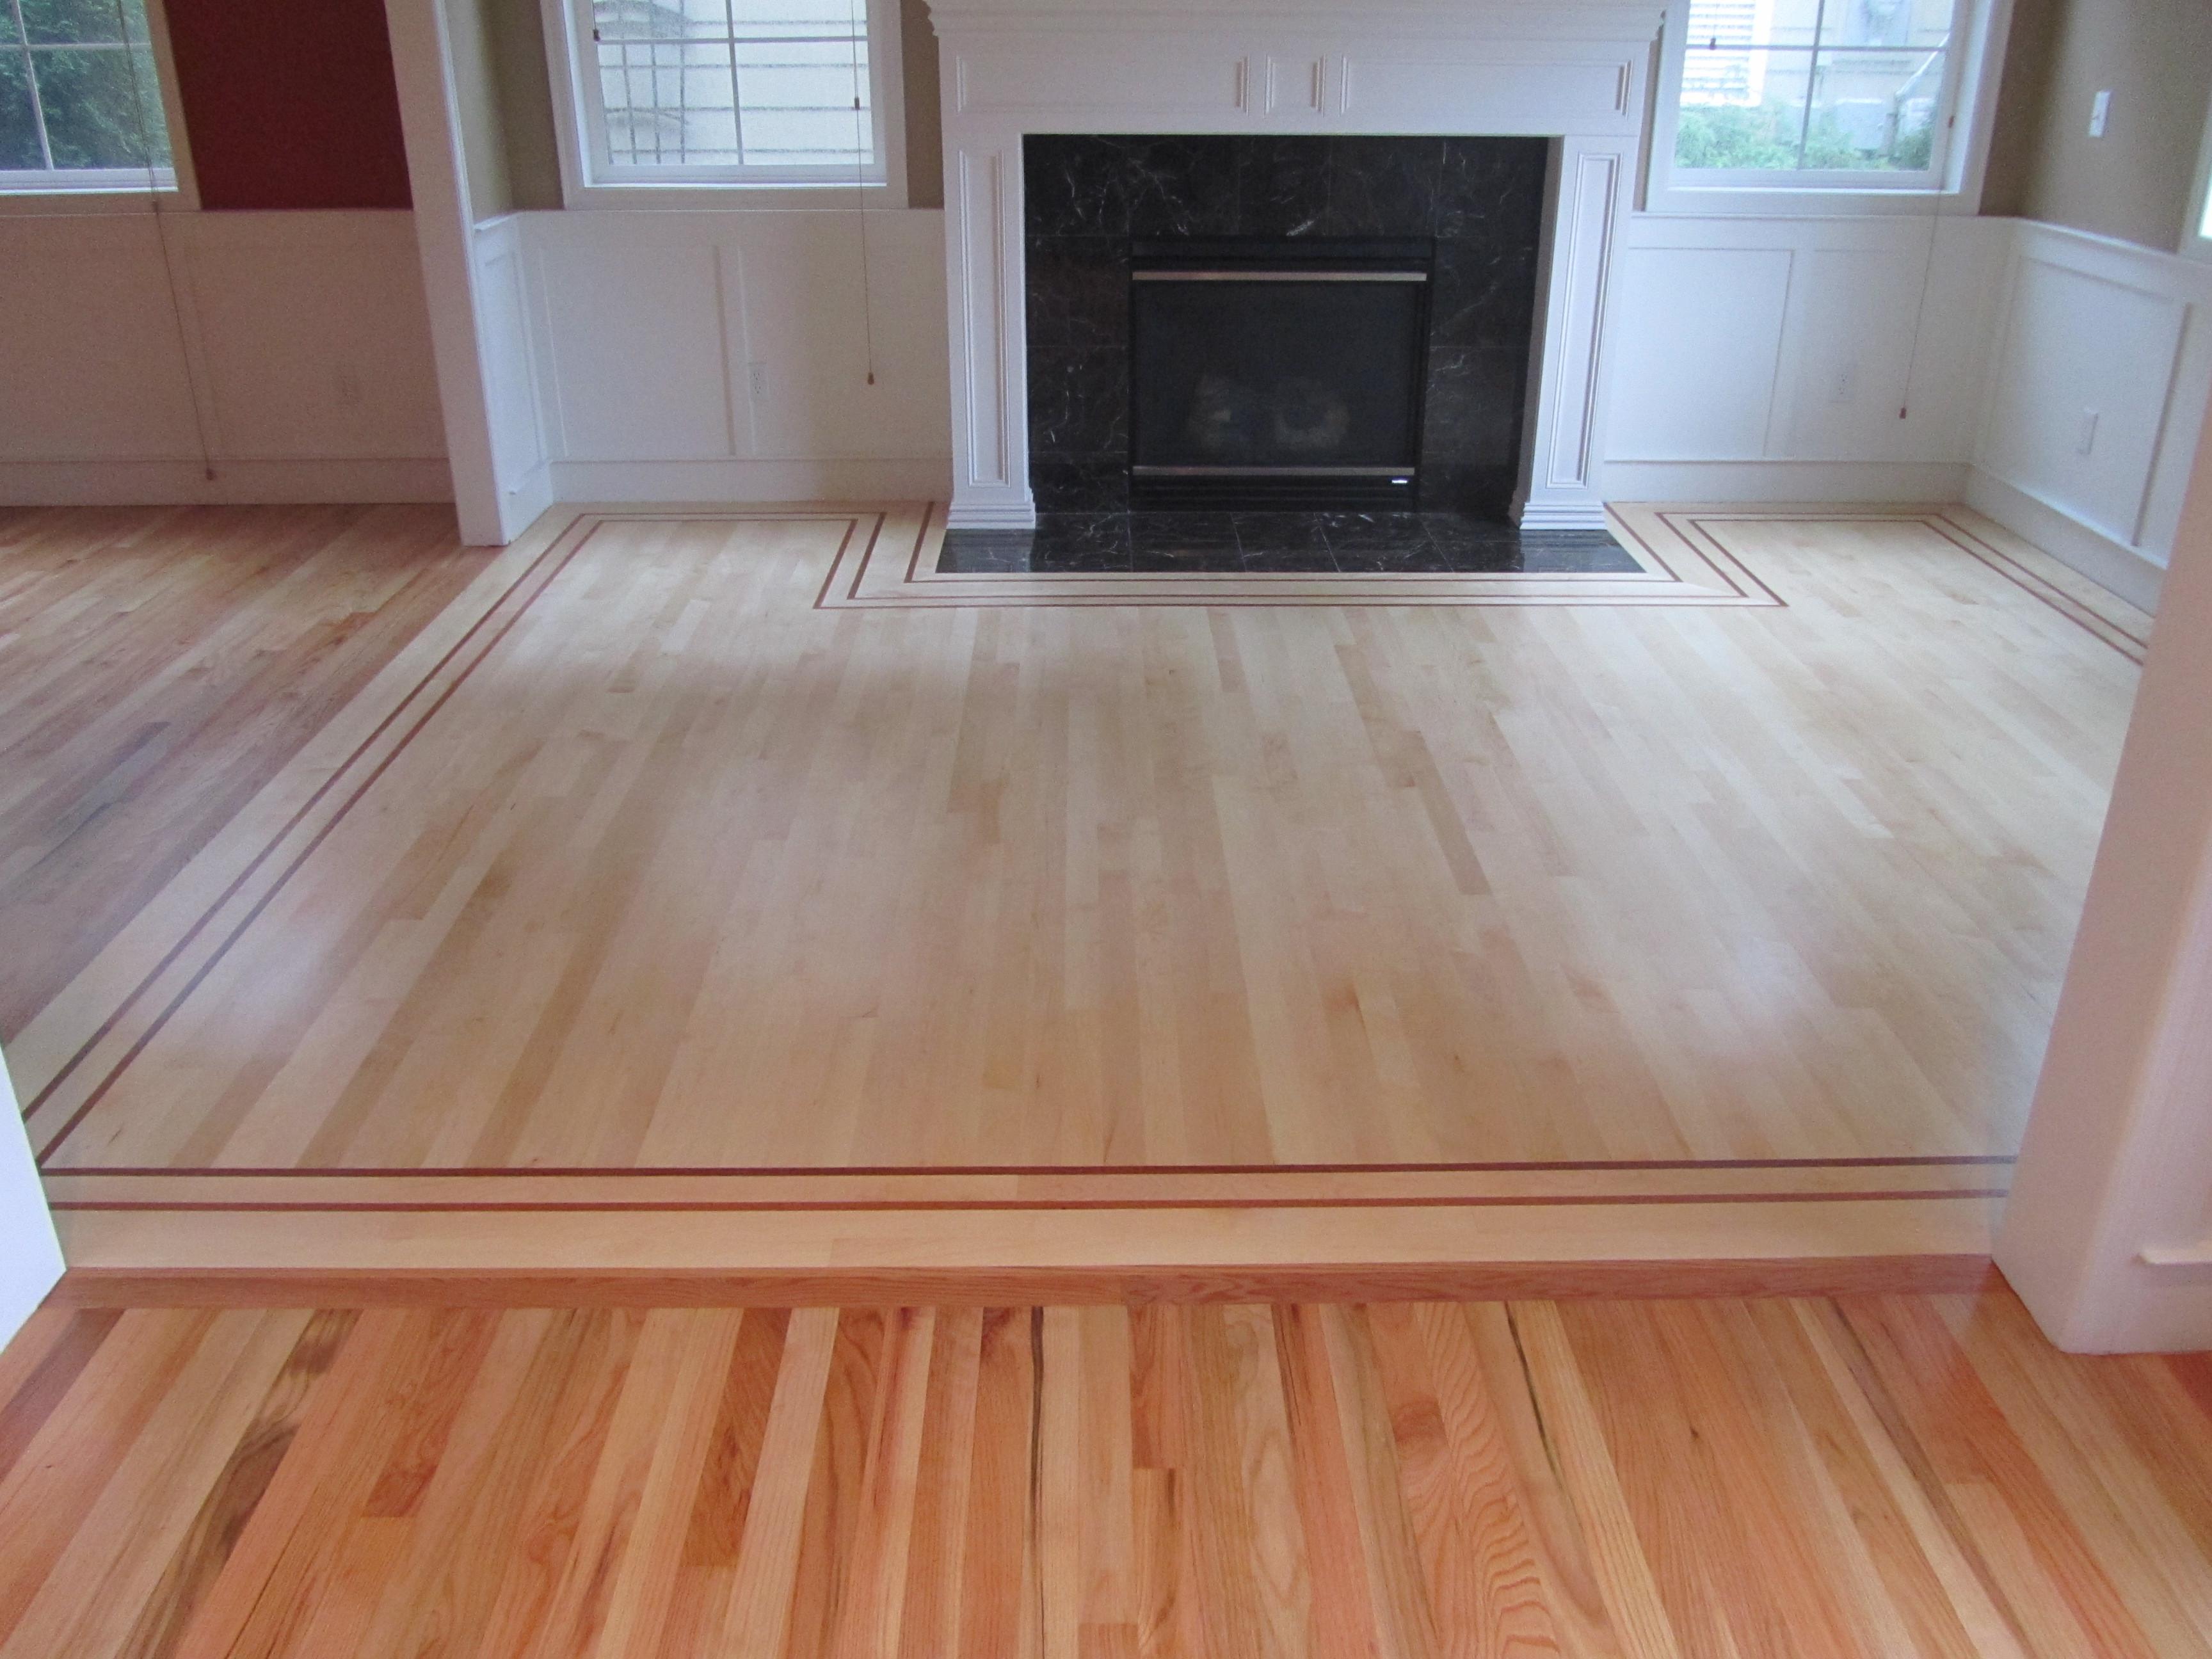 pictures of hardwood floors with borders of hardwood floor refinishing richmond va floor transition laminate to in hardwood floor refinishing richmond va hardwood flooring contractor